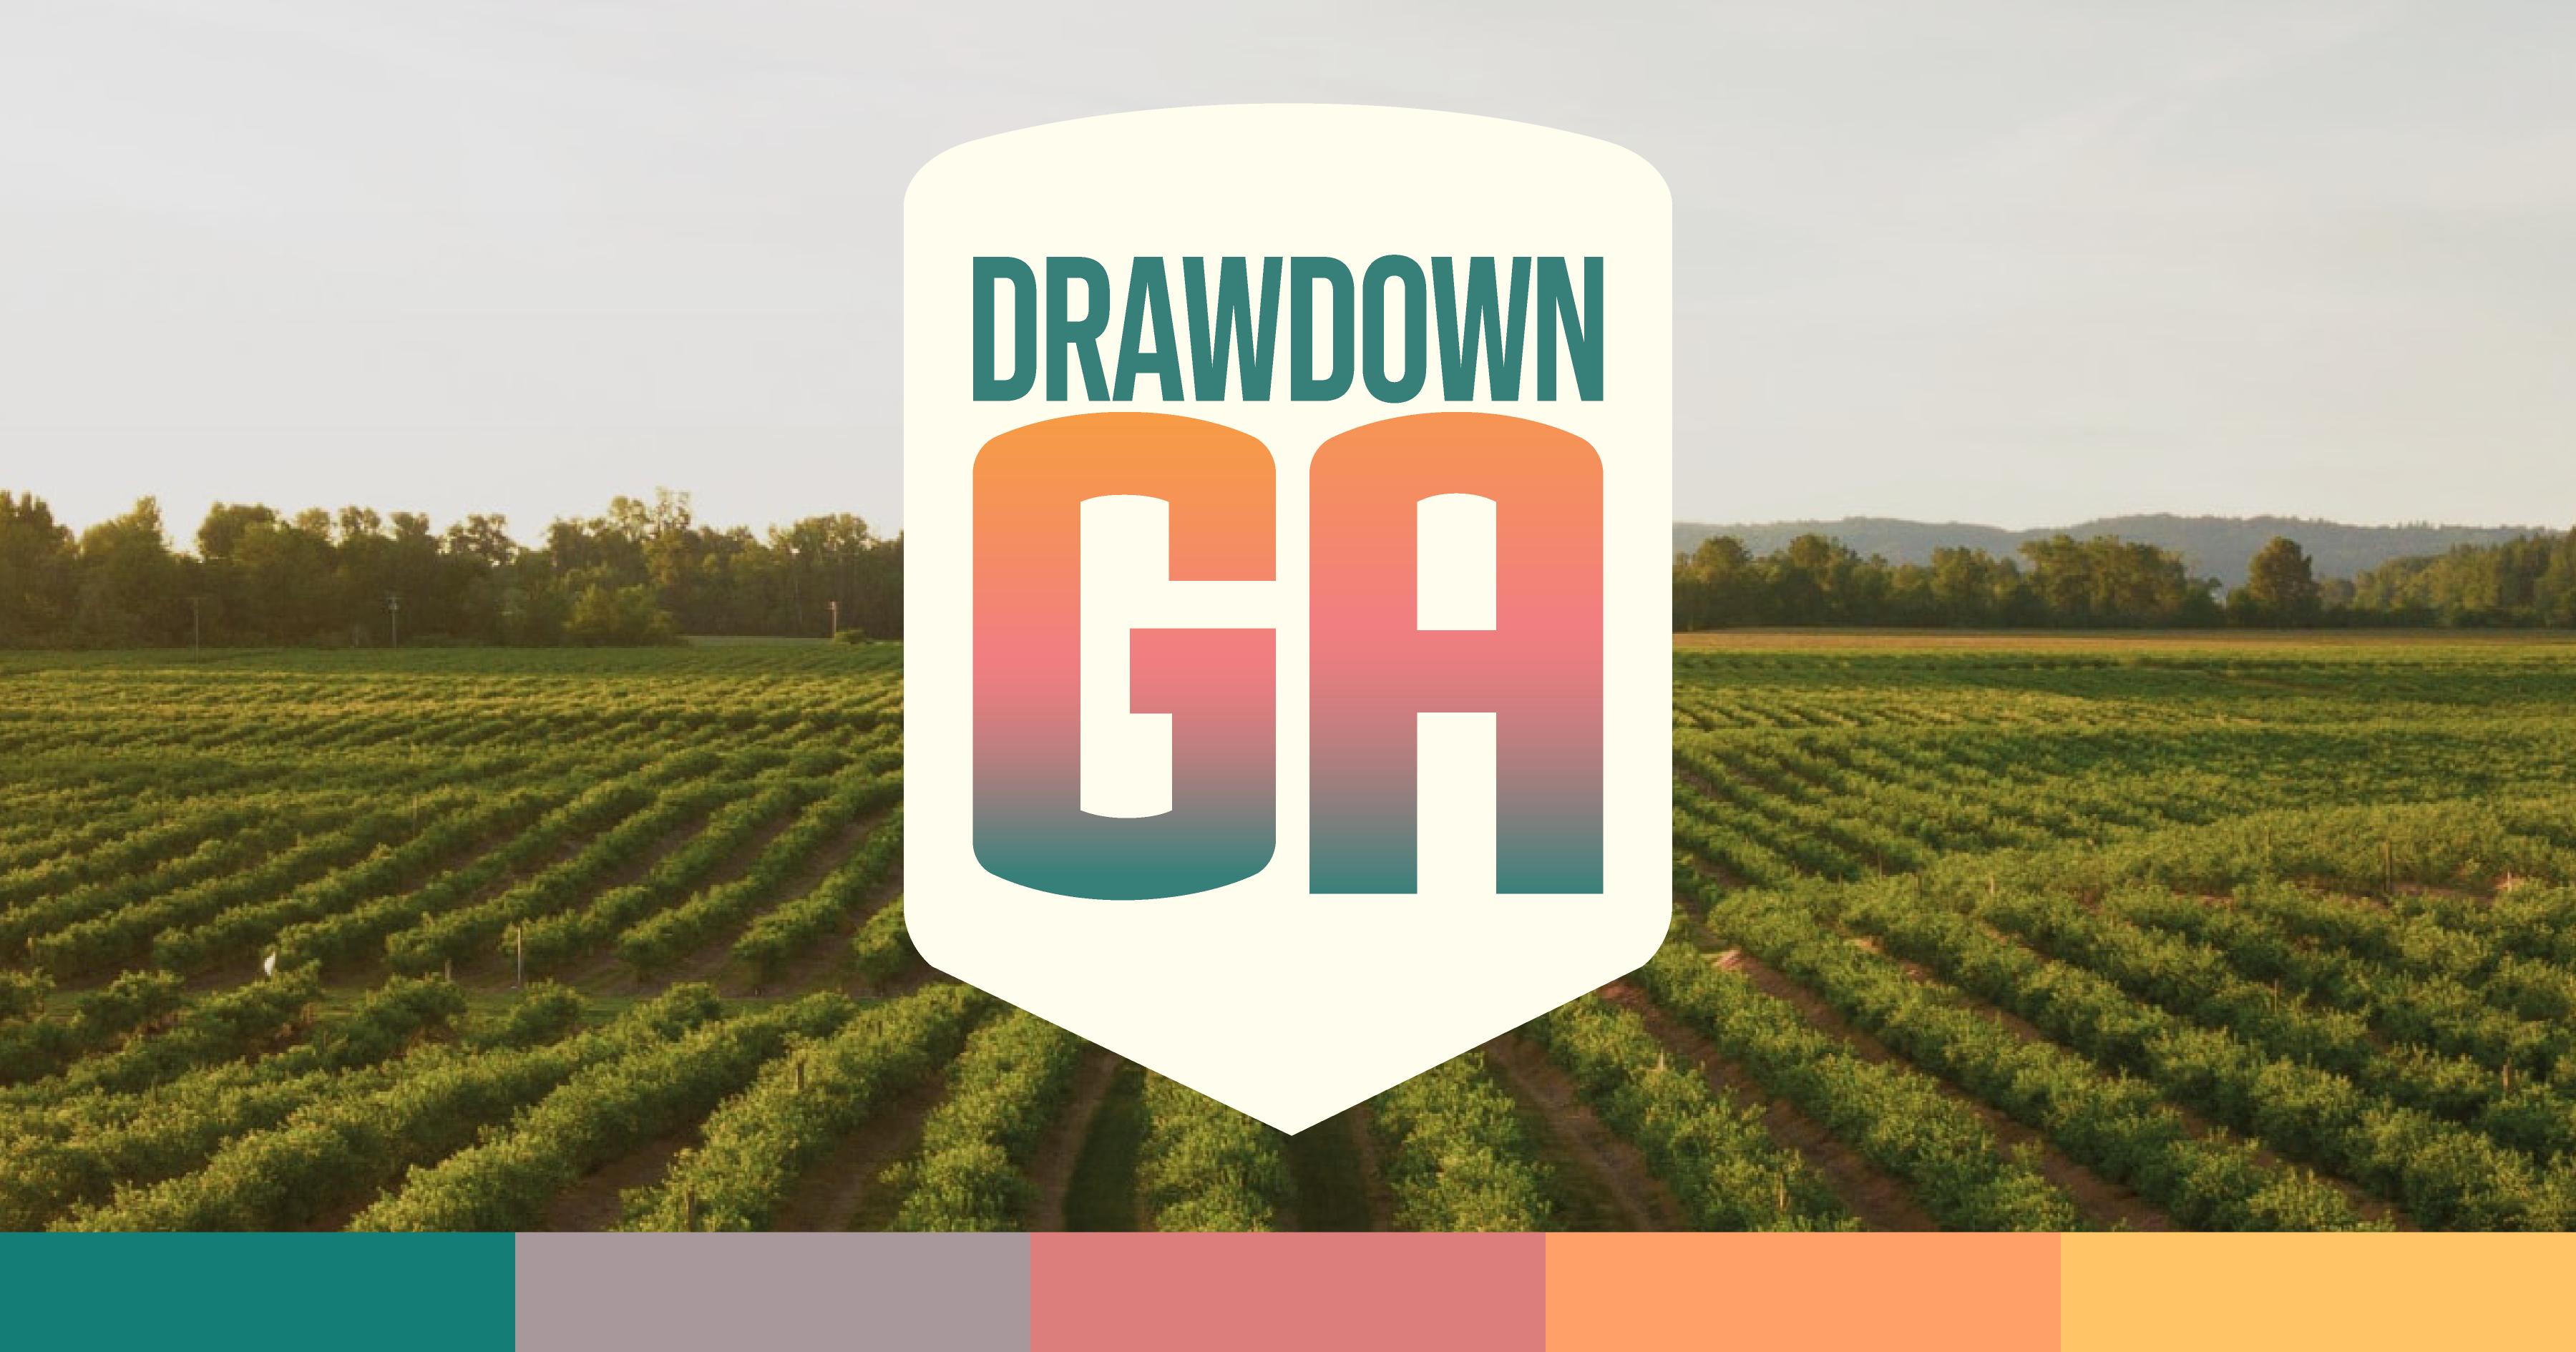 Drawdown Georgia farm image